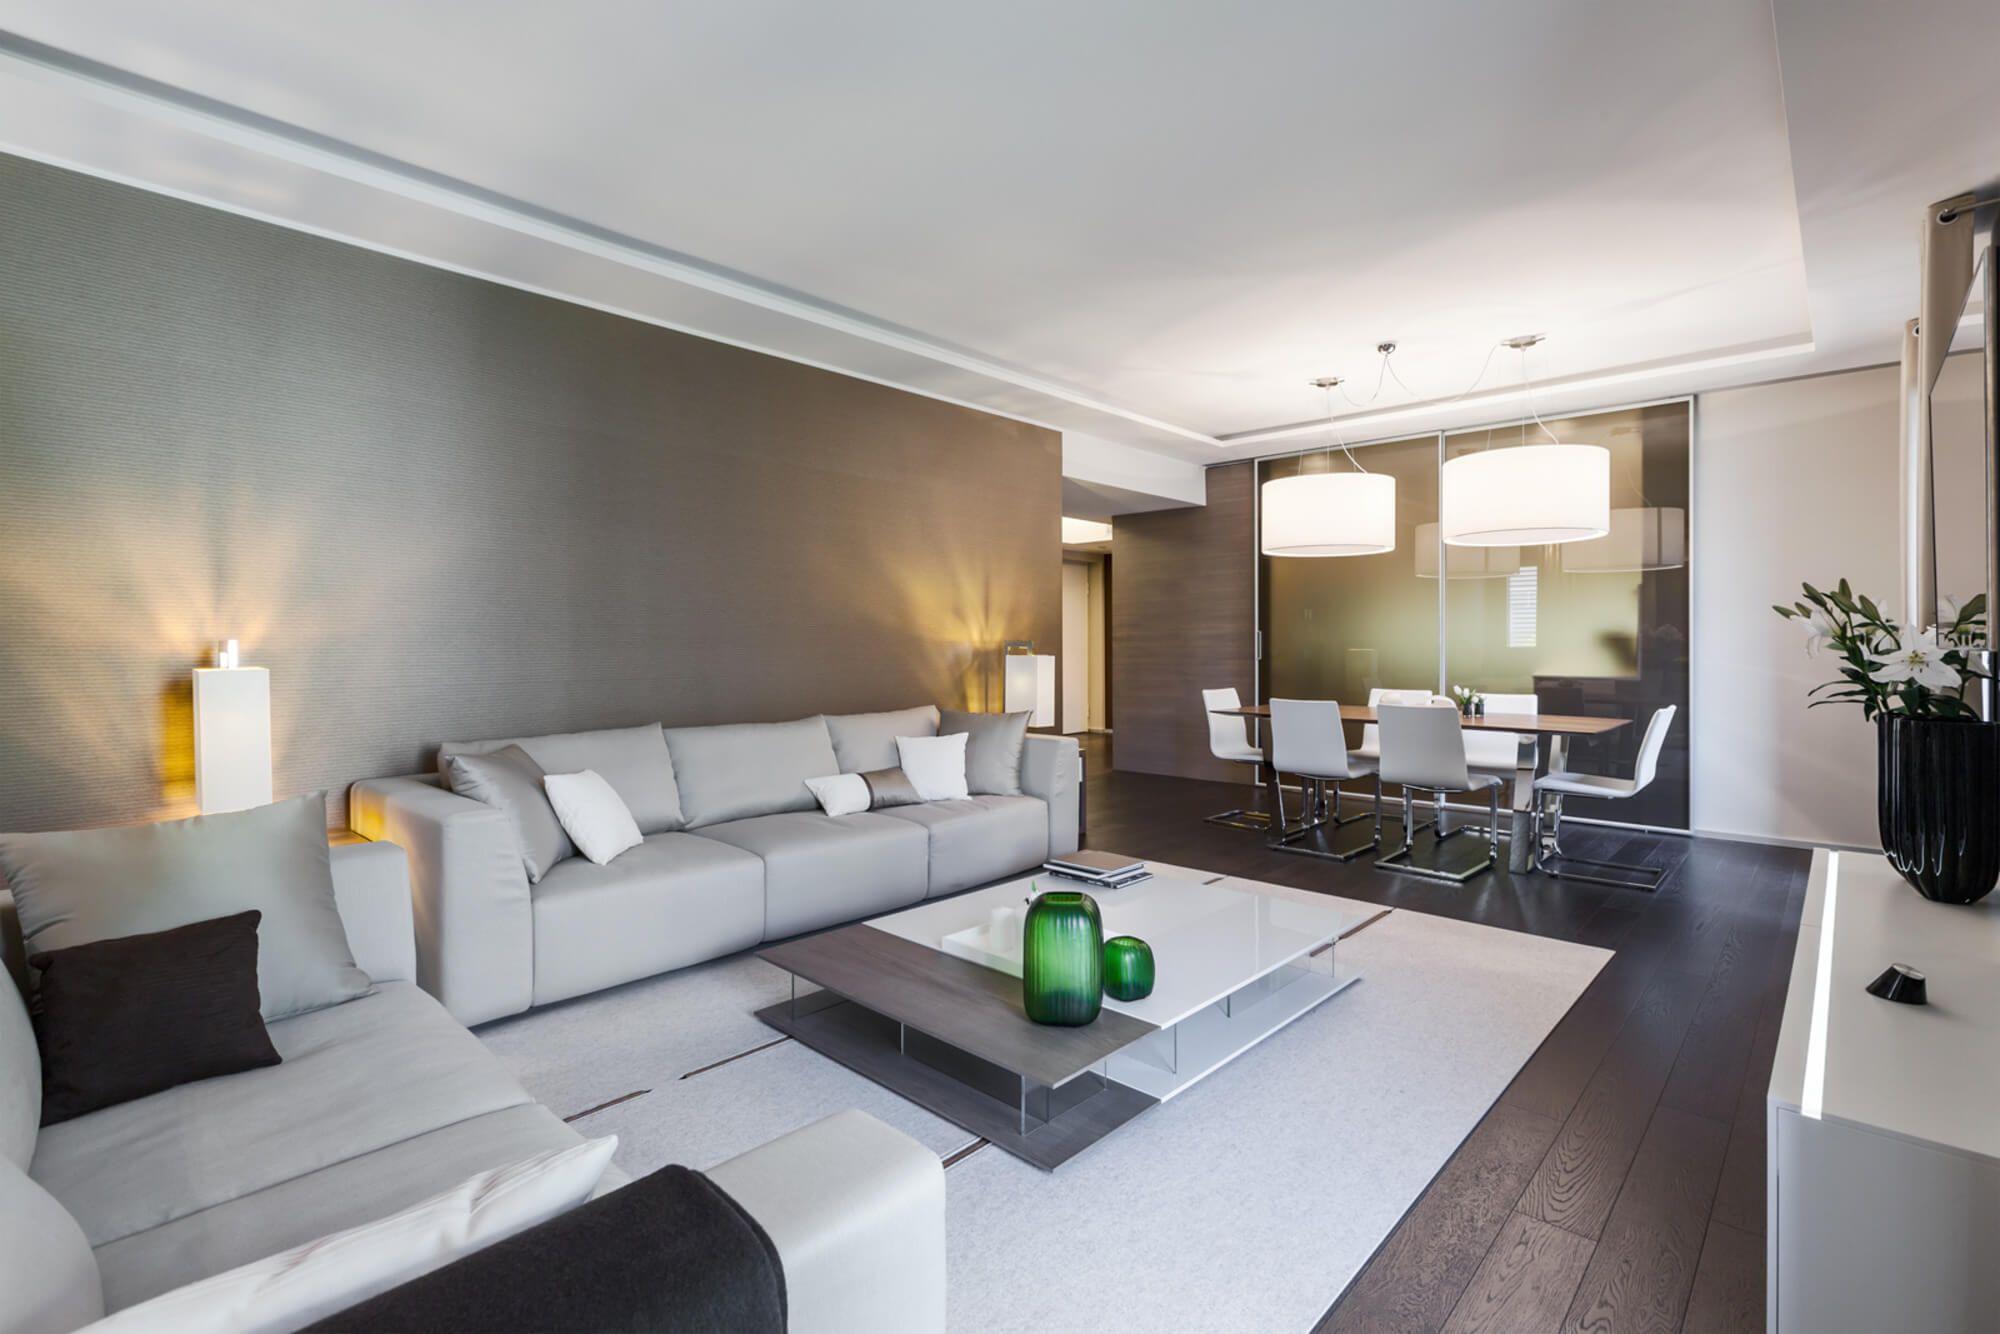 Apartment in Monaco by NG-Studio | Home Decor | Pinterest | Monaco ...